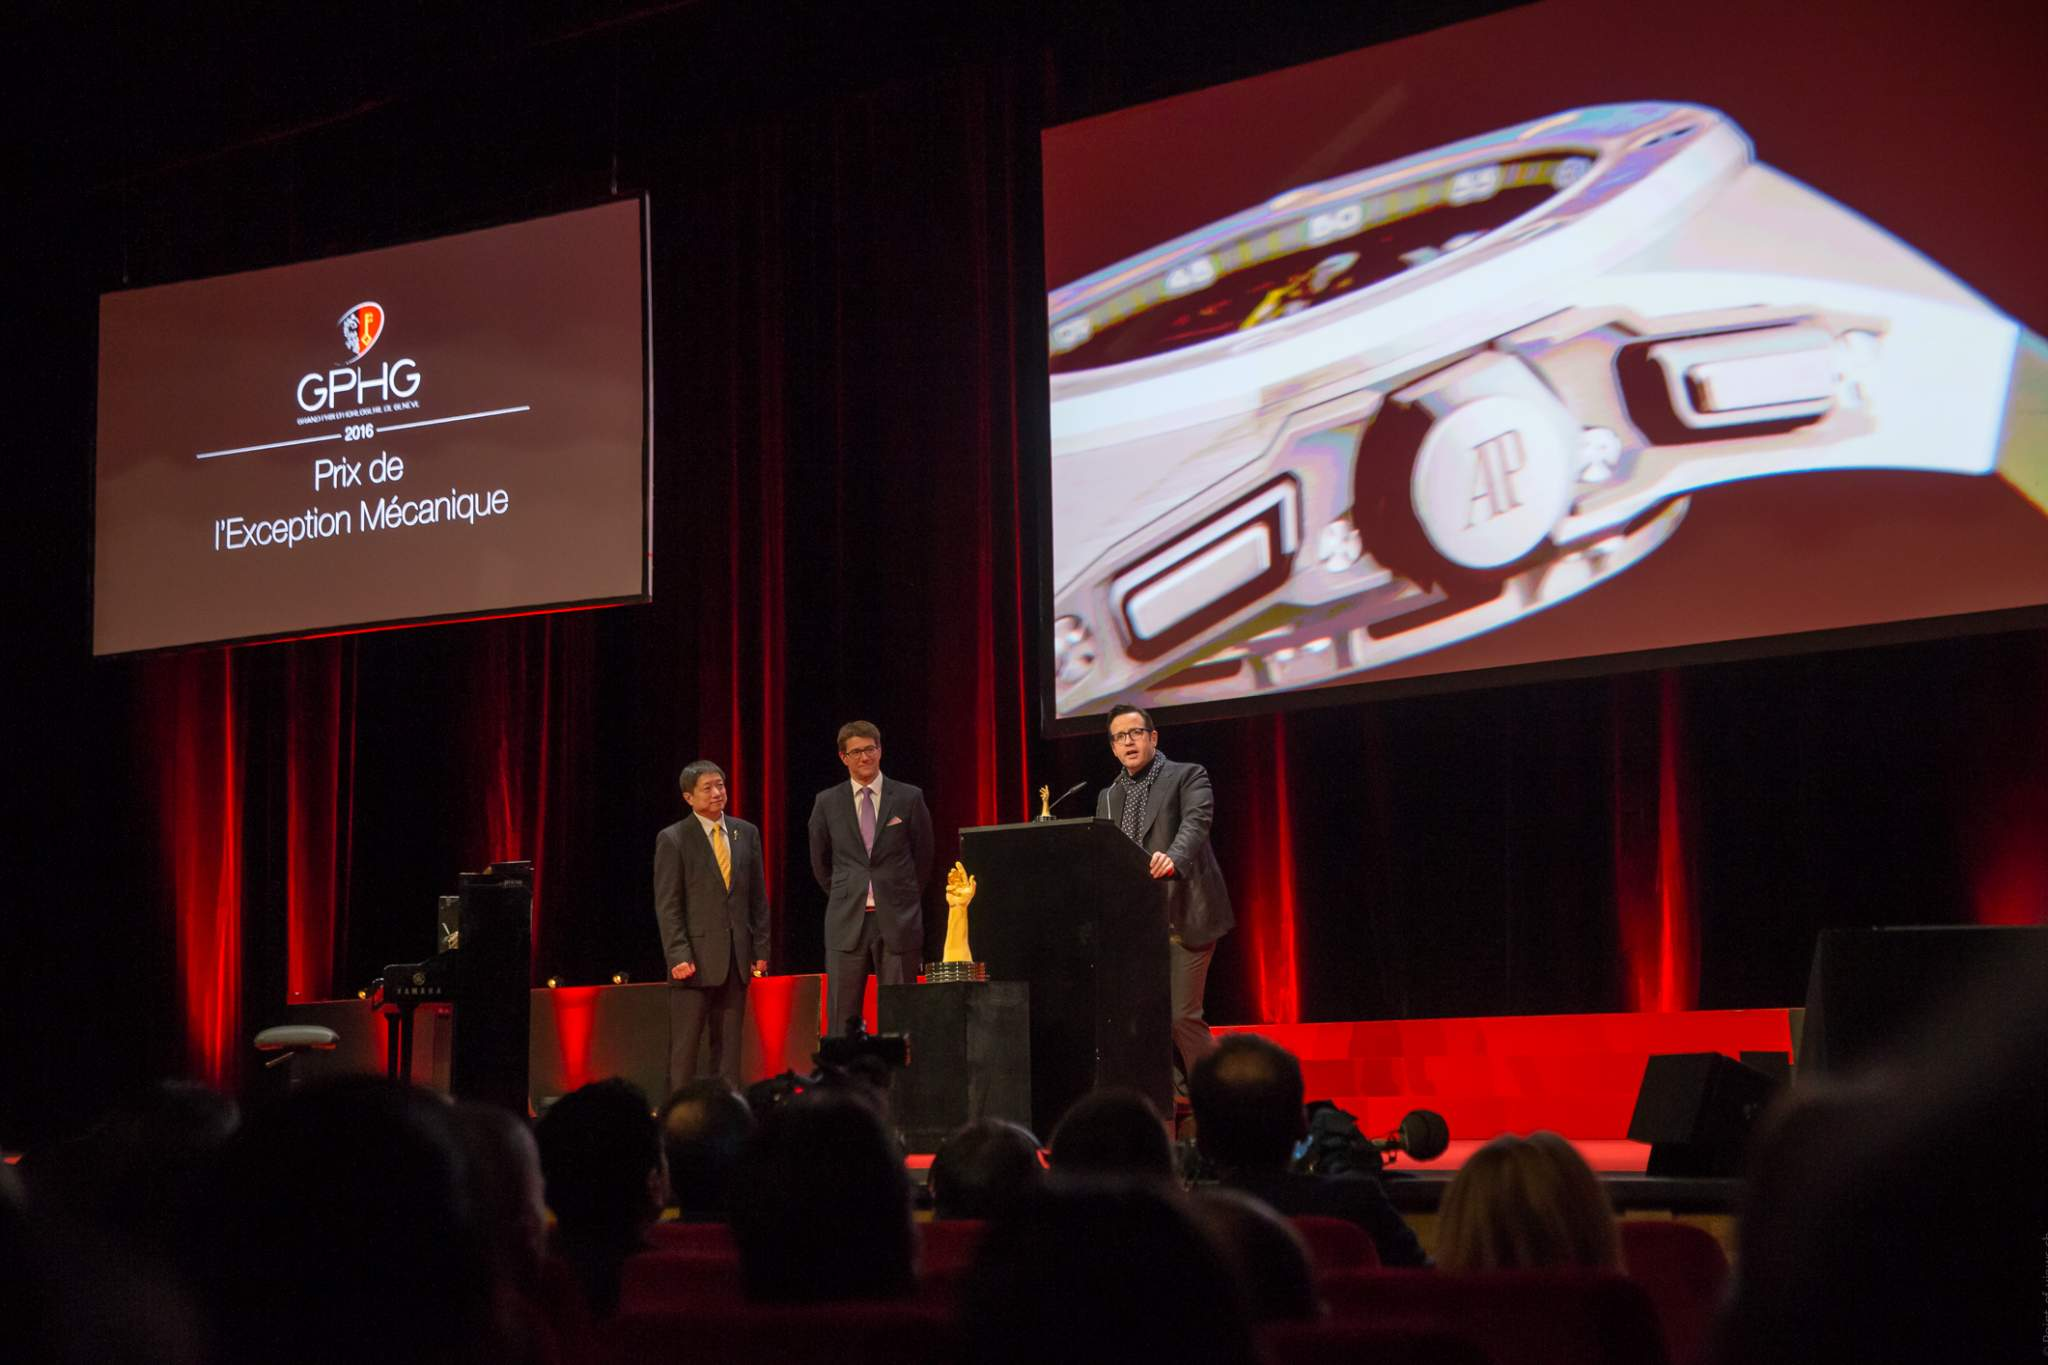 Zhixiang Ding and Gianfranco Ritschel (jury members) et François Bennahmias (CEO of Audemars Piguet, winner of the Mechanical Exception Watch Prize 2016)